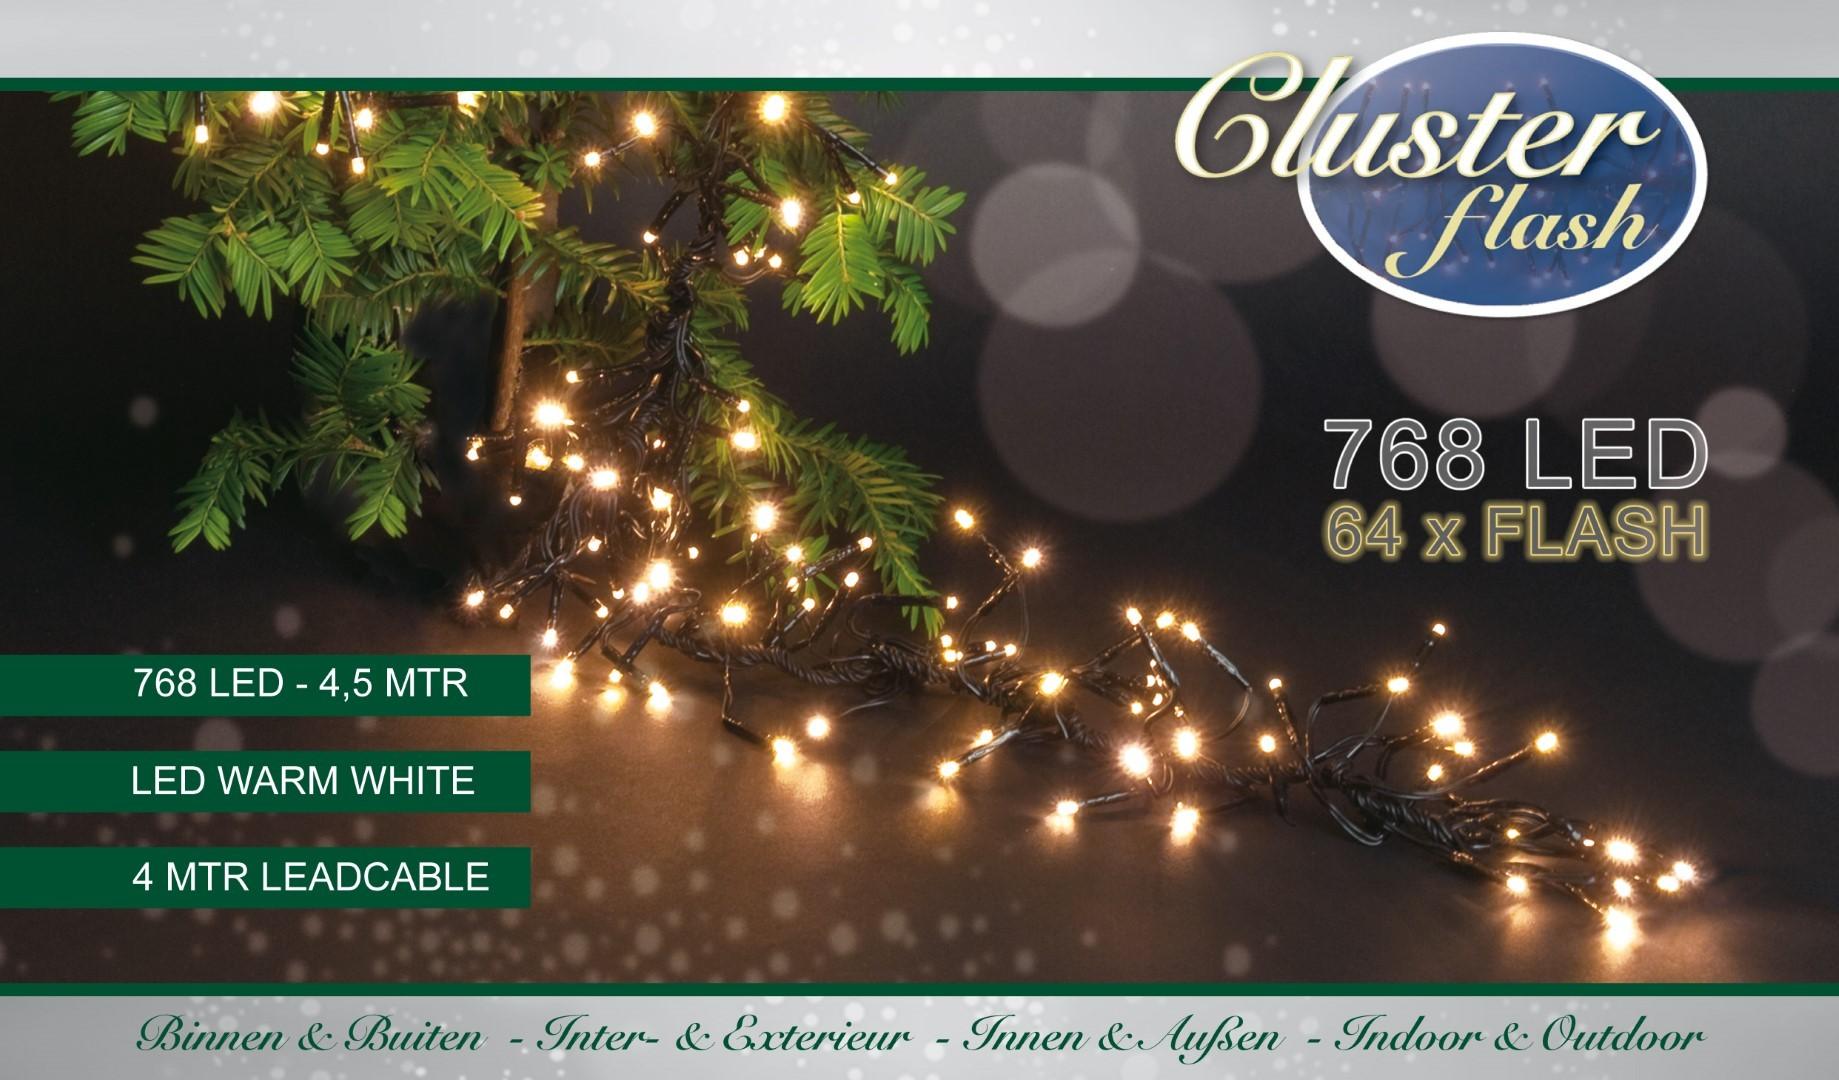 Clusterverlichting met knipperlampjes 768l/4,5m led warm wit met 64l knipperend